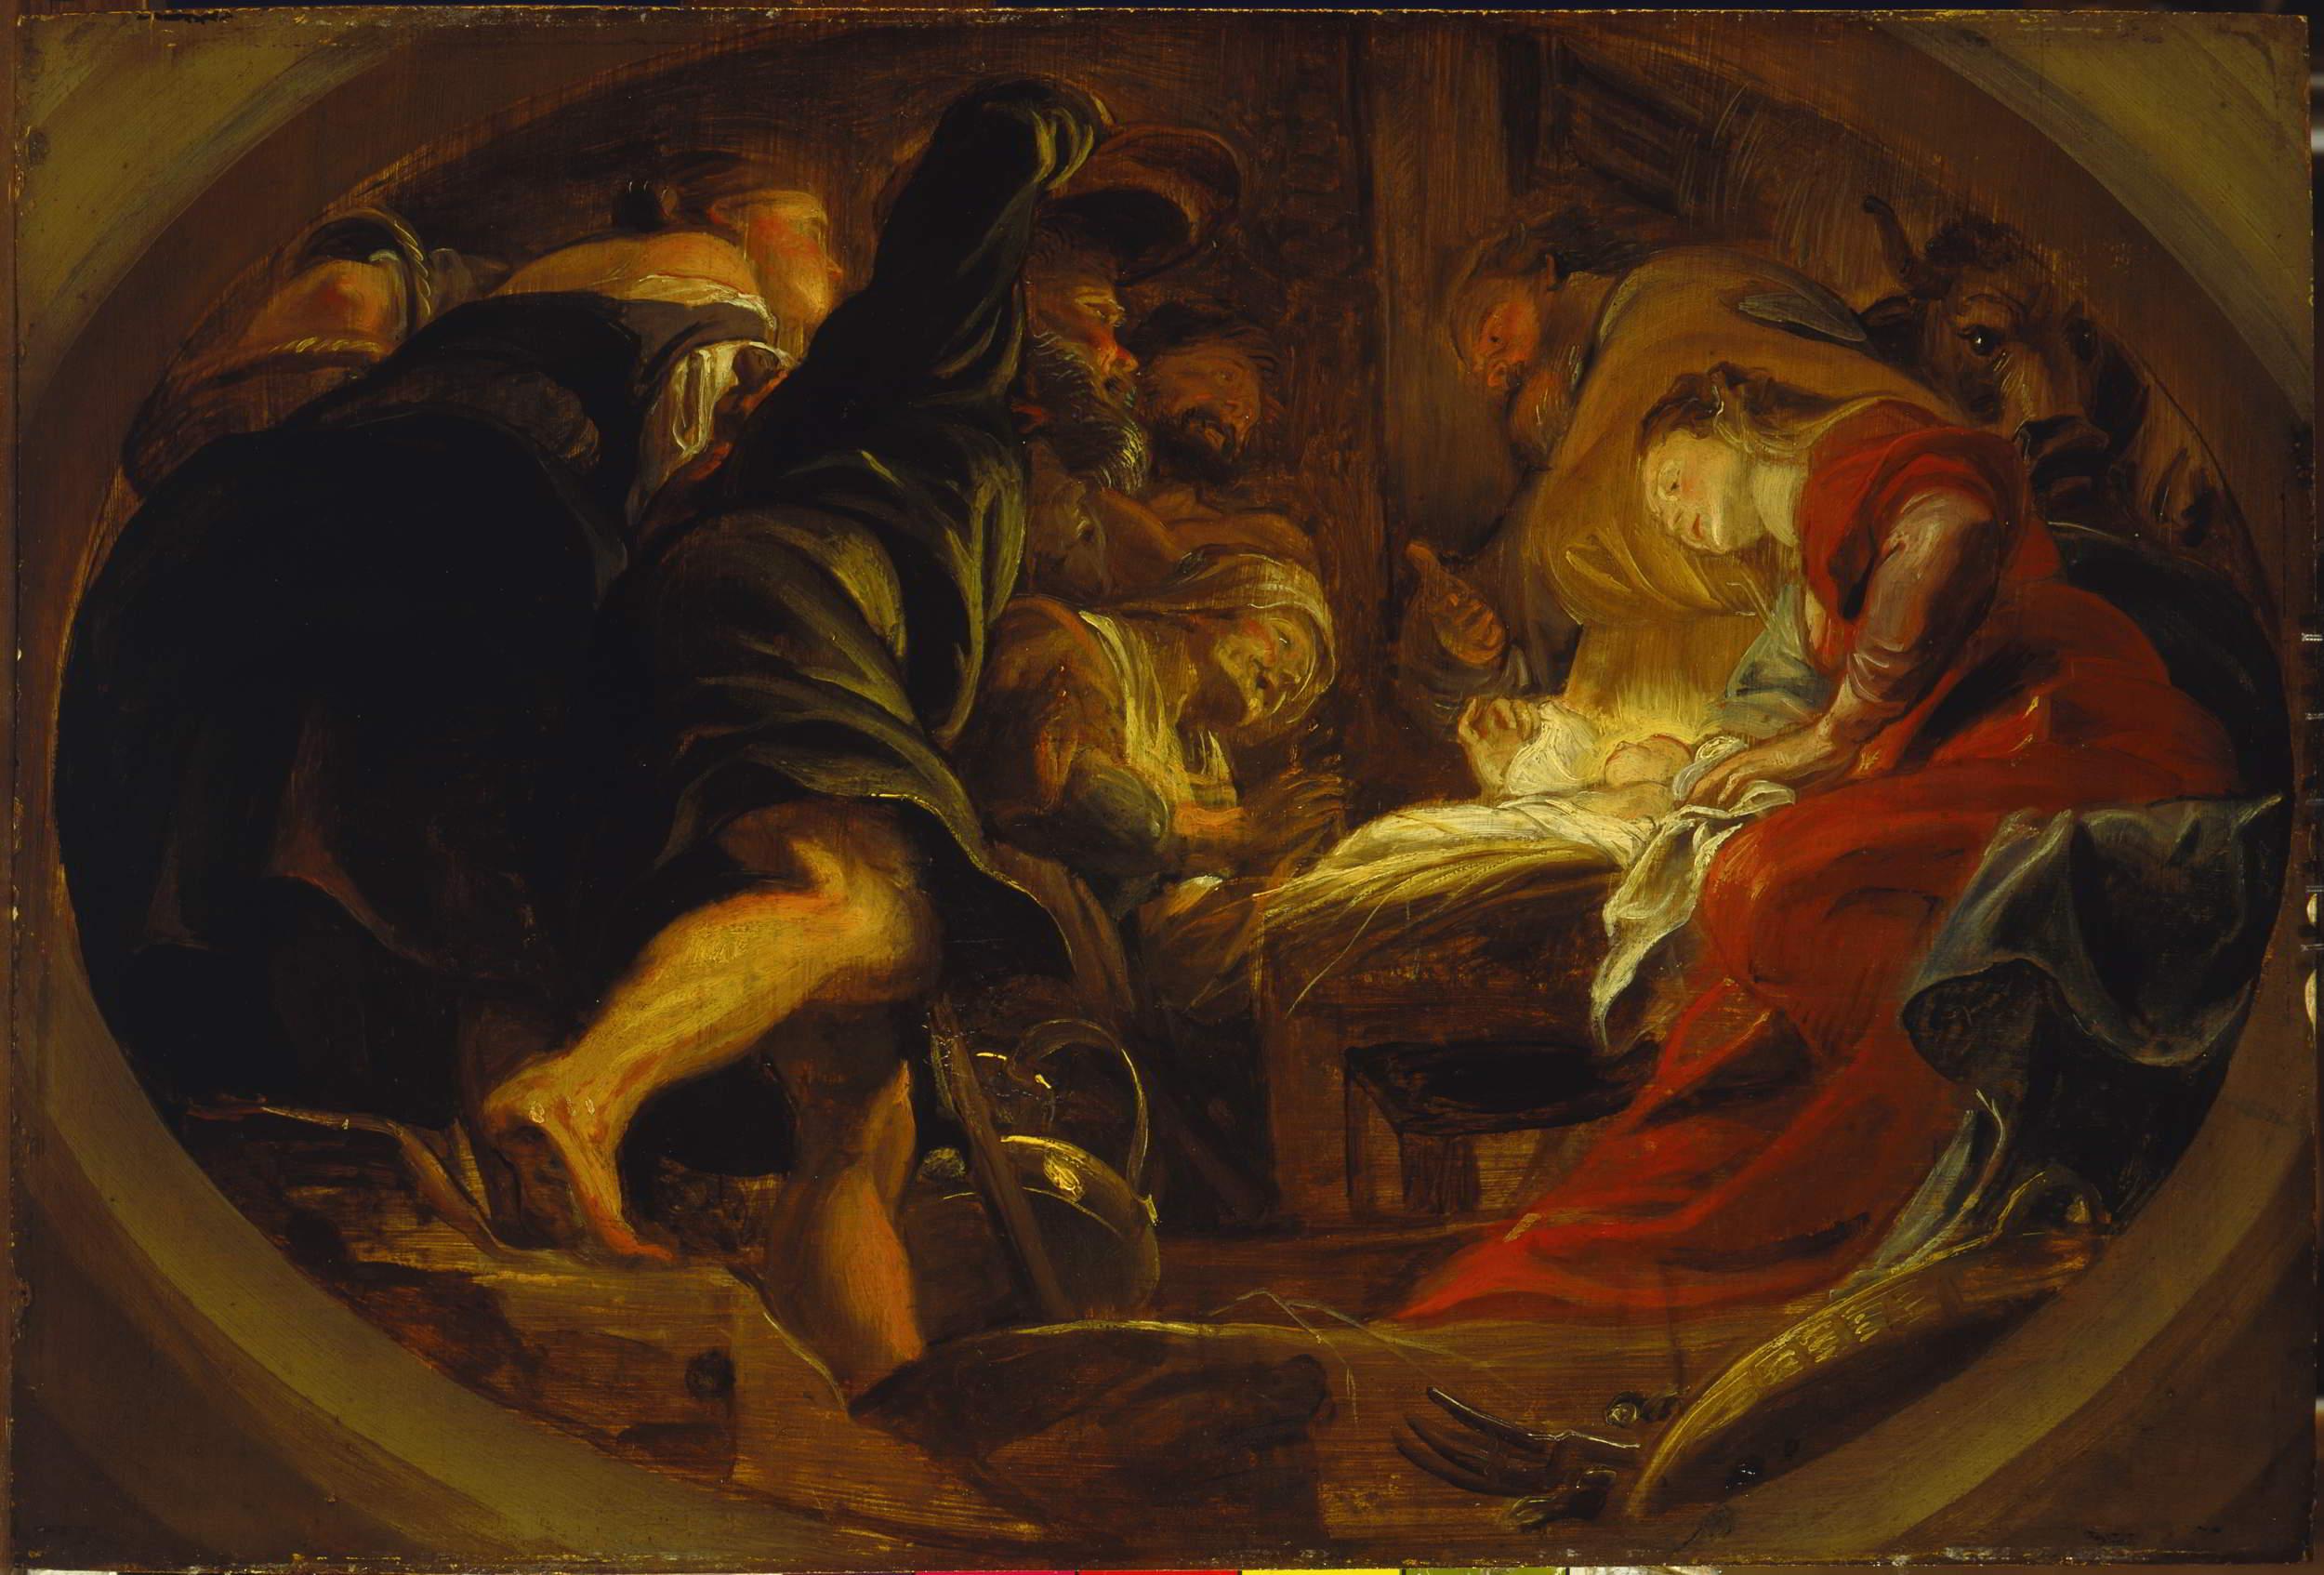 Rubens (1577-1649), <em>Adoration of the Shepherds</em>, 1620 Kunsthistorisches Museum, Vienna